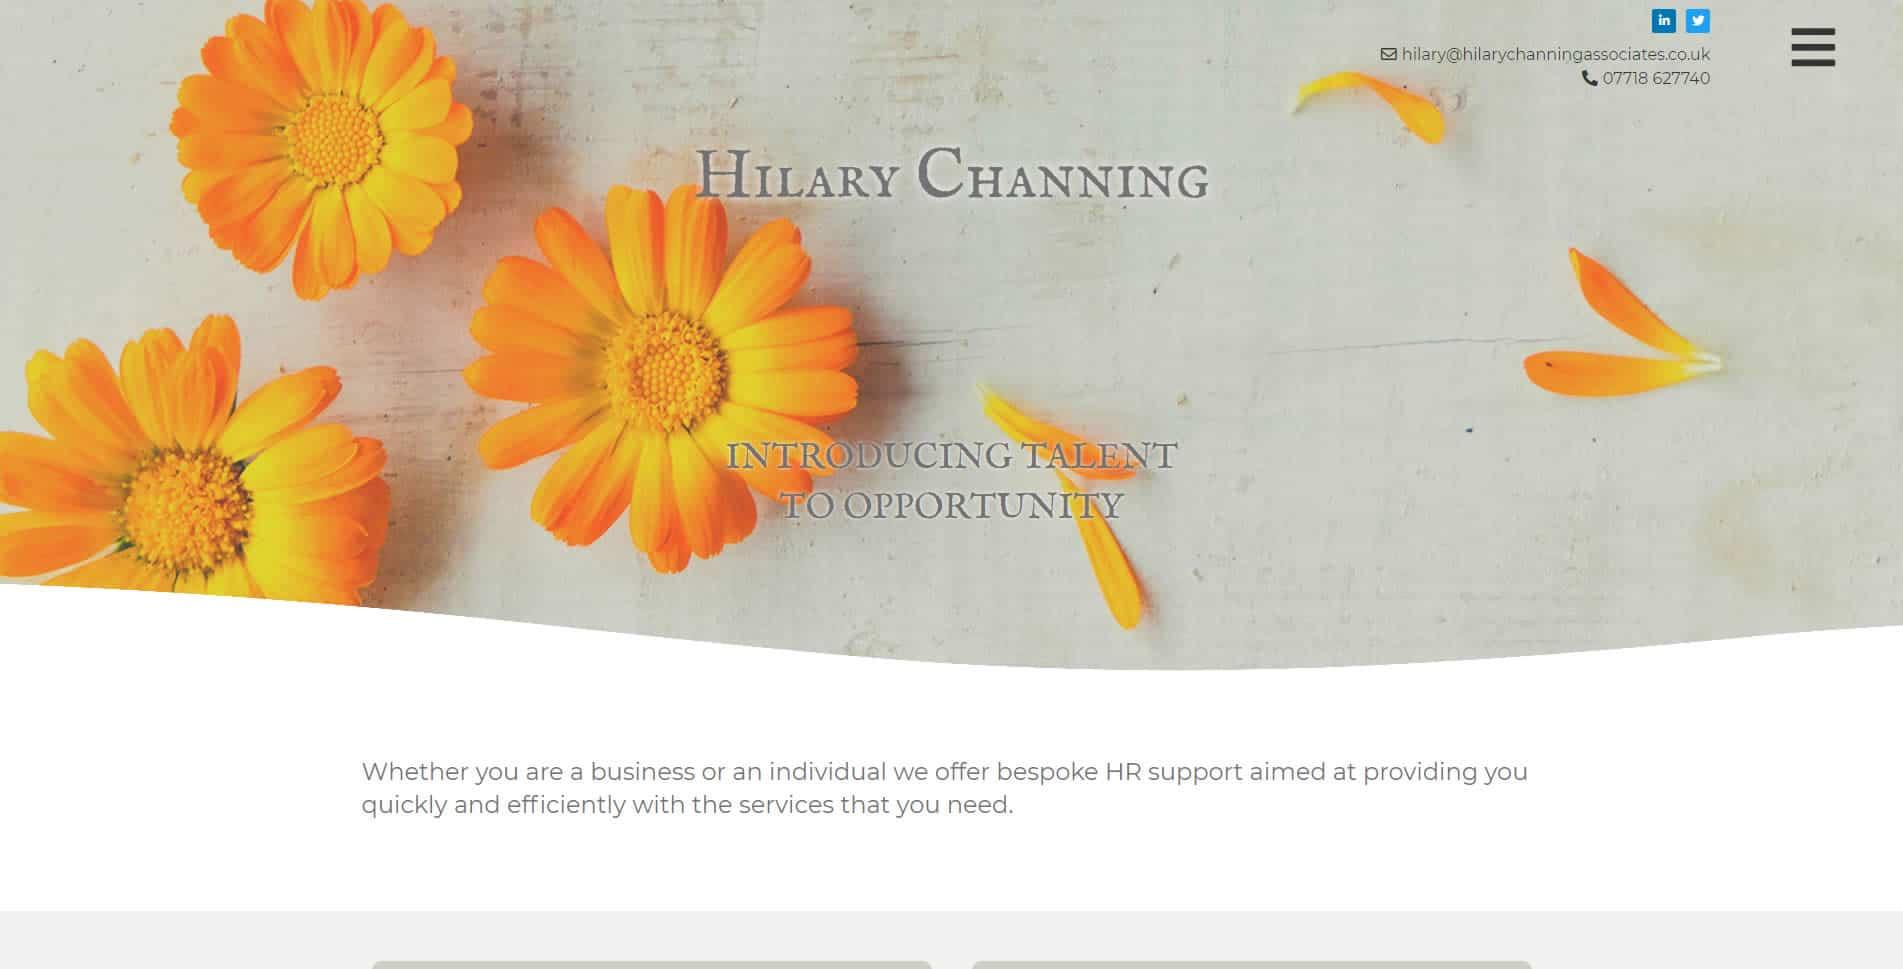 Hilary Channing Associates